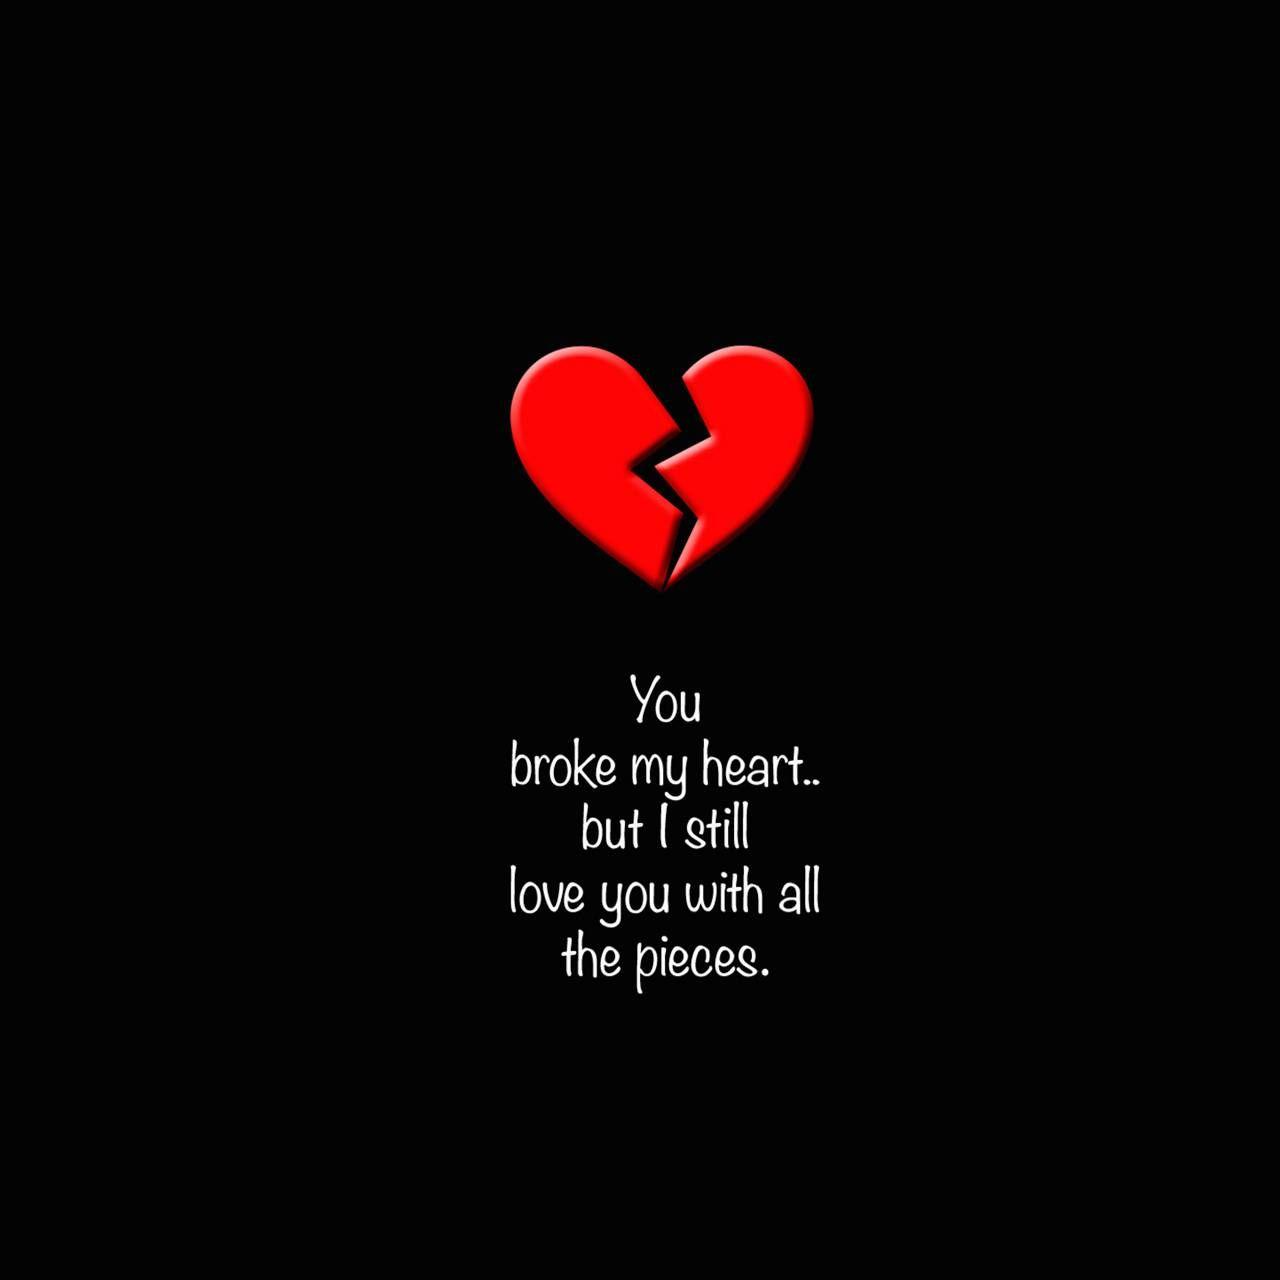 Wallpaper Love Broken Heart Black Background